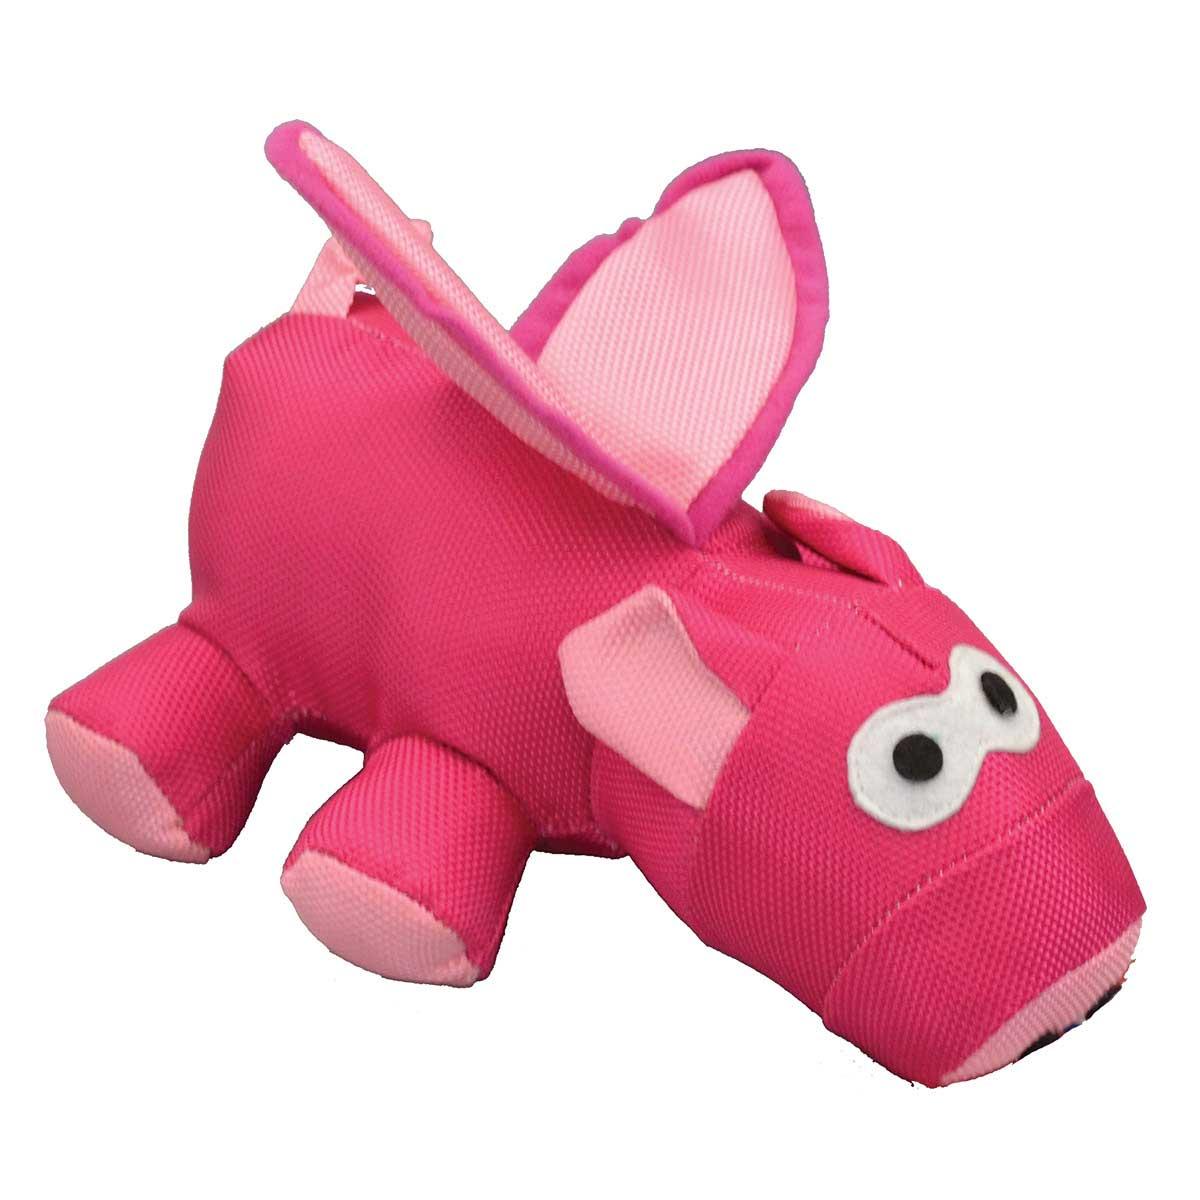 Slinger Flying Pig Stuffed Dog Toy - 8.5 inch